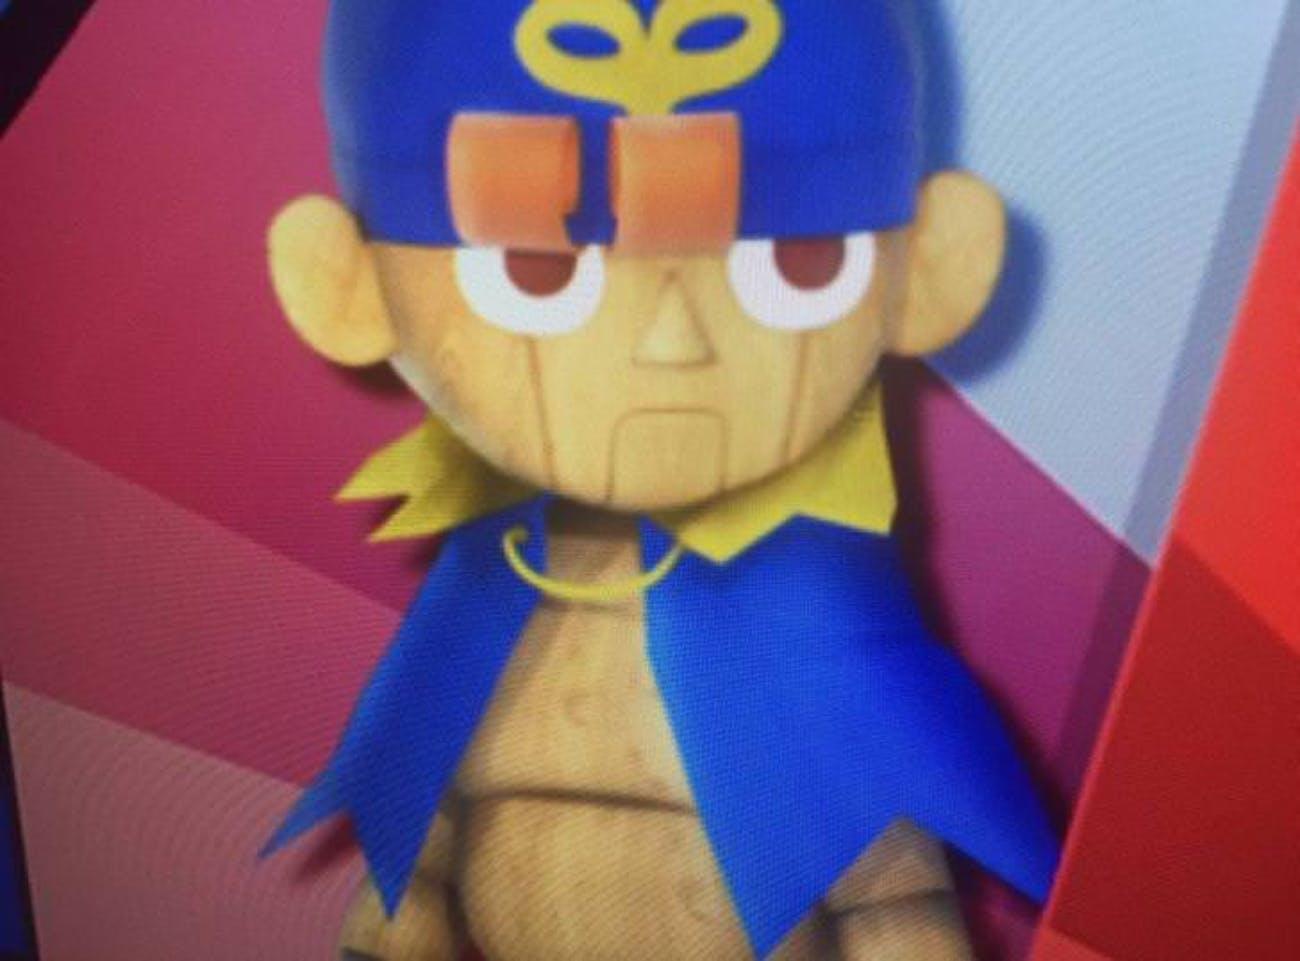 Geno in 'Super Smash Bros. Ultimate'?